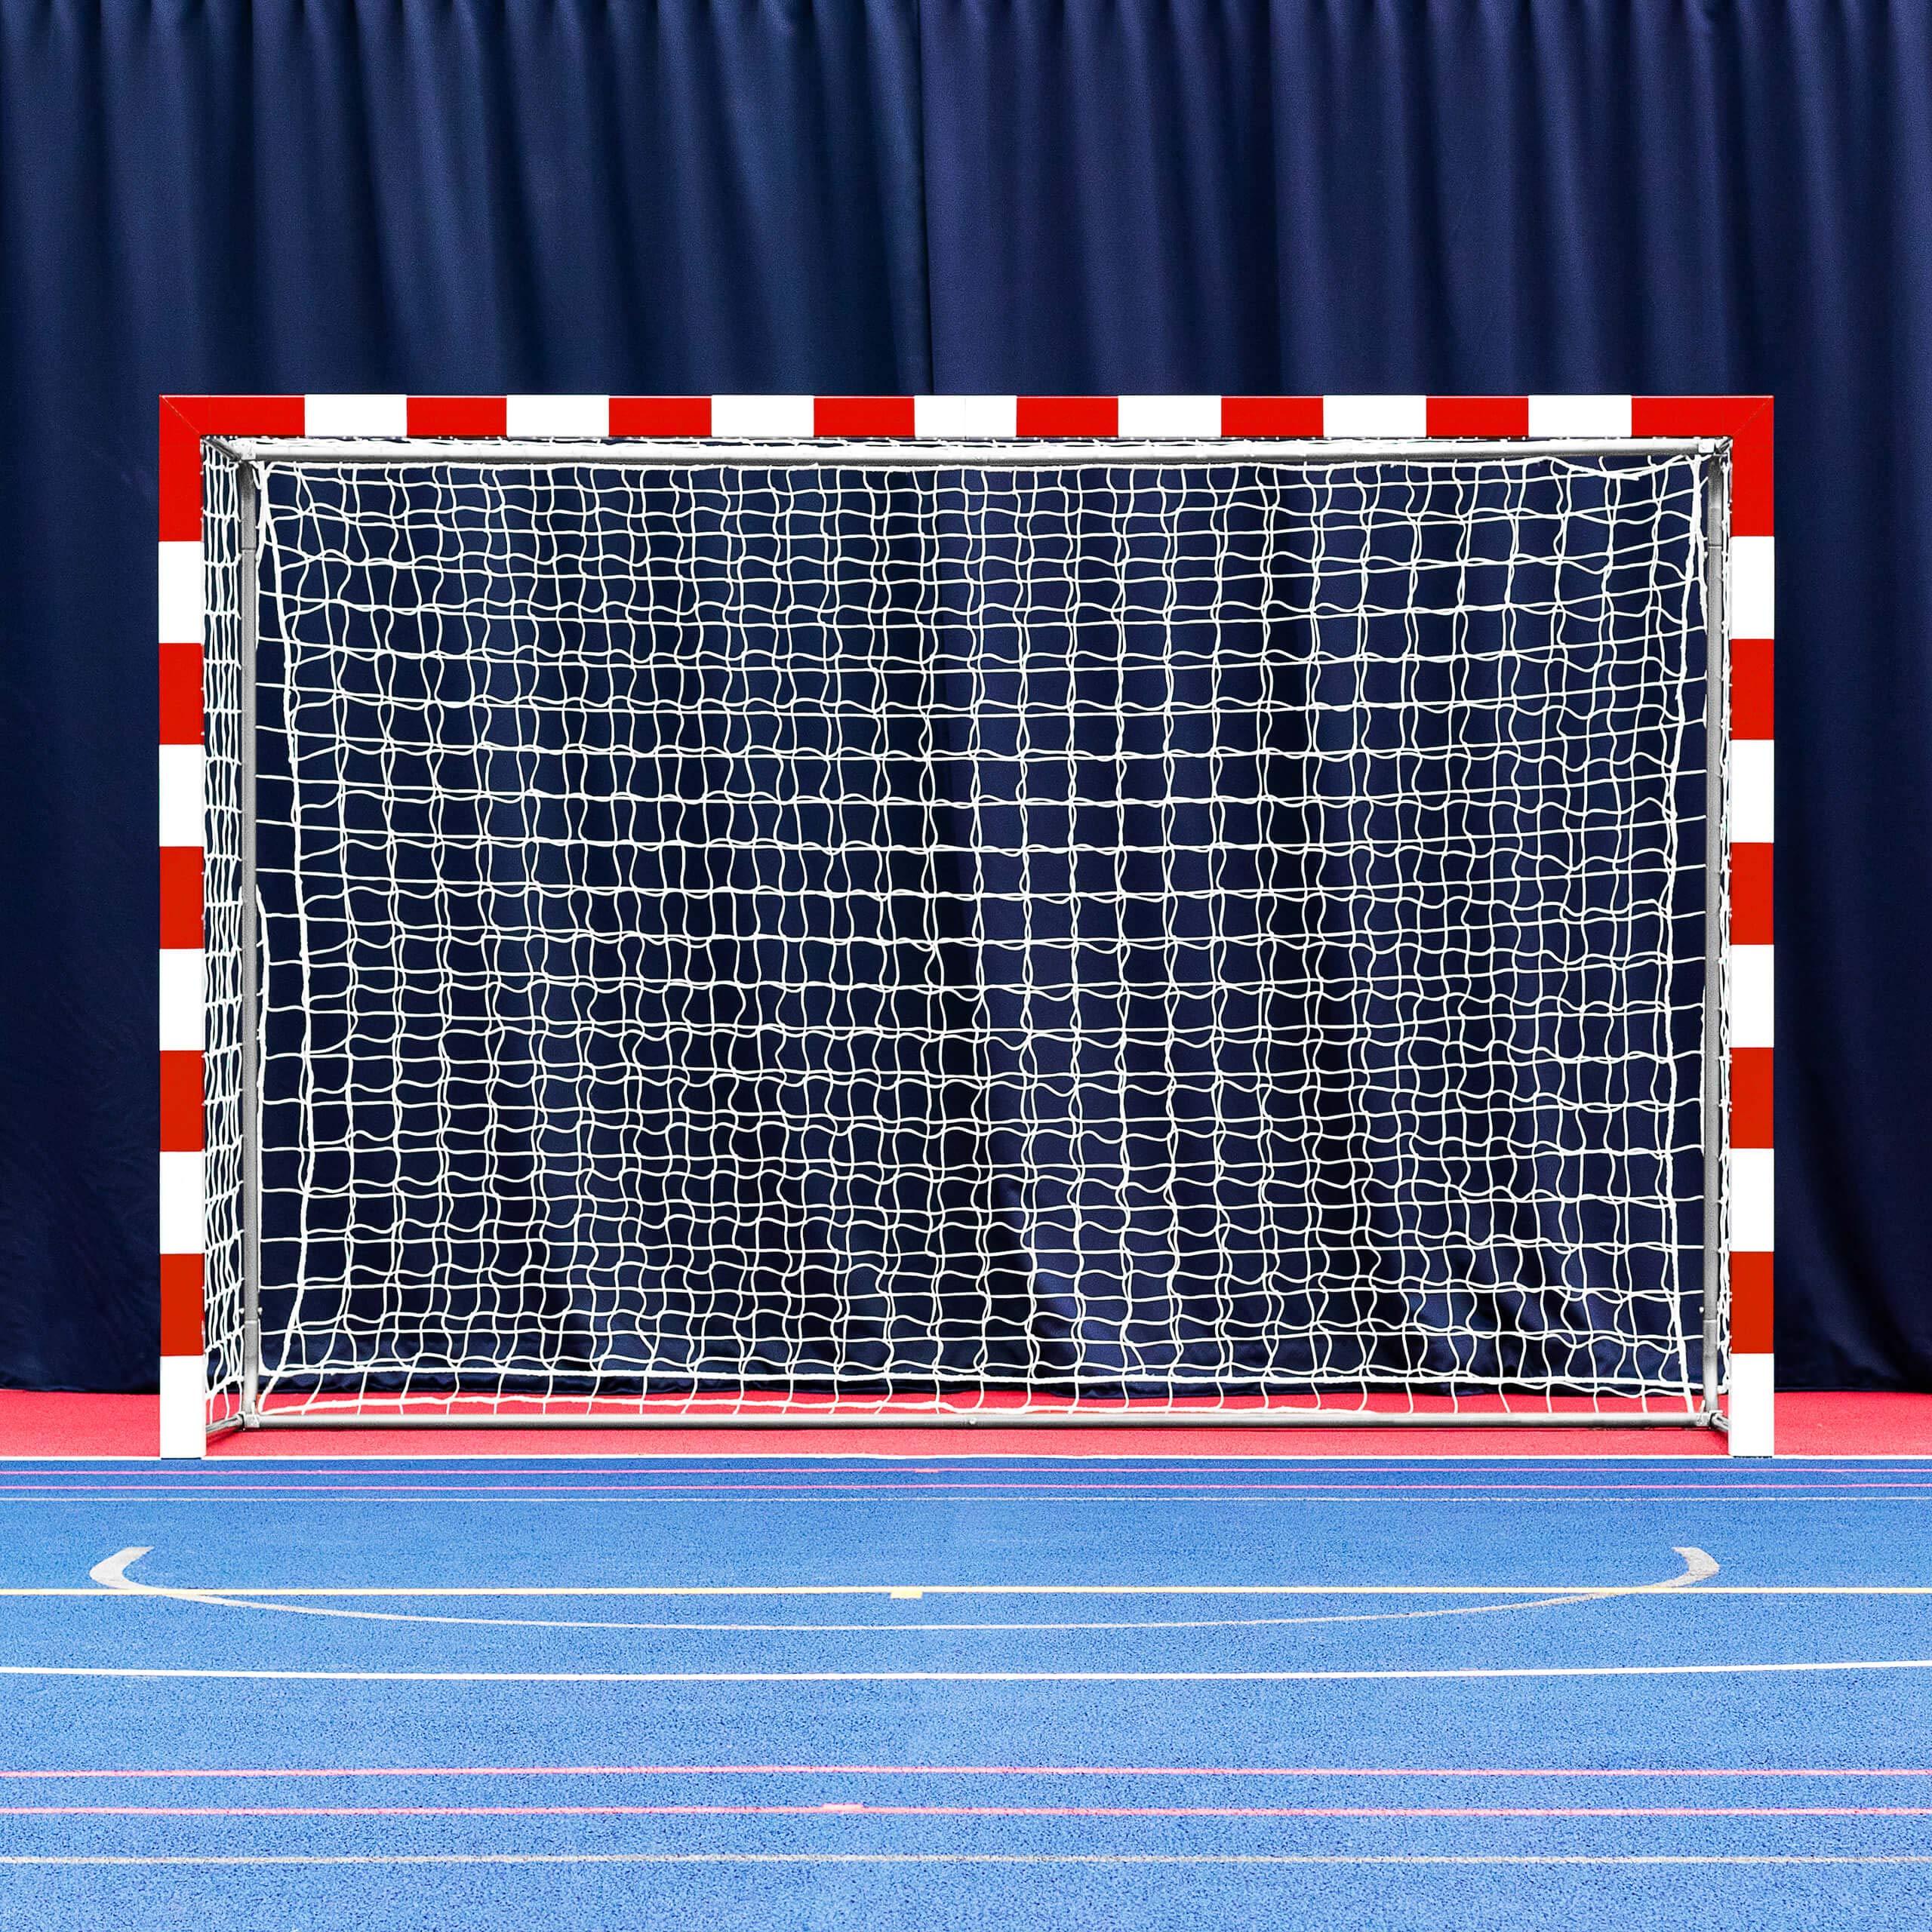 Forza Alu80 Competition Handball Goals | IHF Regulation Size 3m x 2m Handball Goal [Net World Sports] (Pair, Red) by Forza (Image #1)